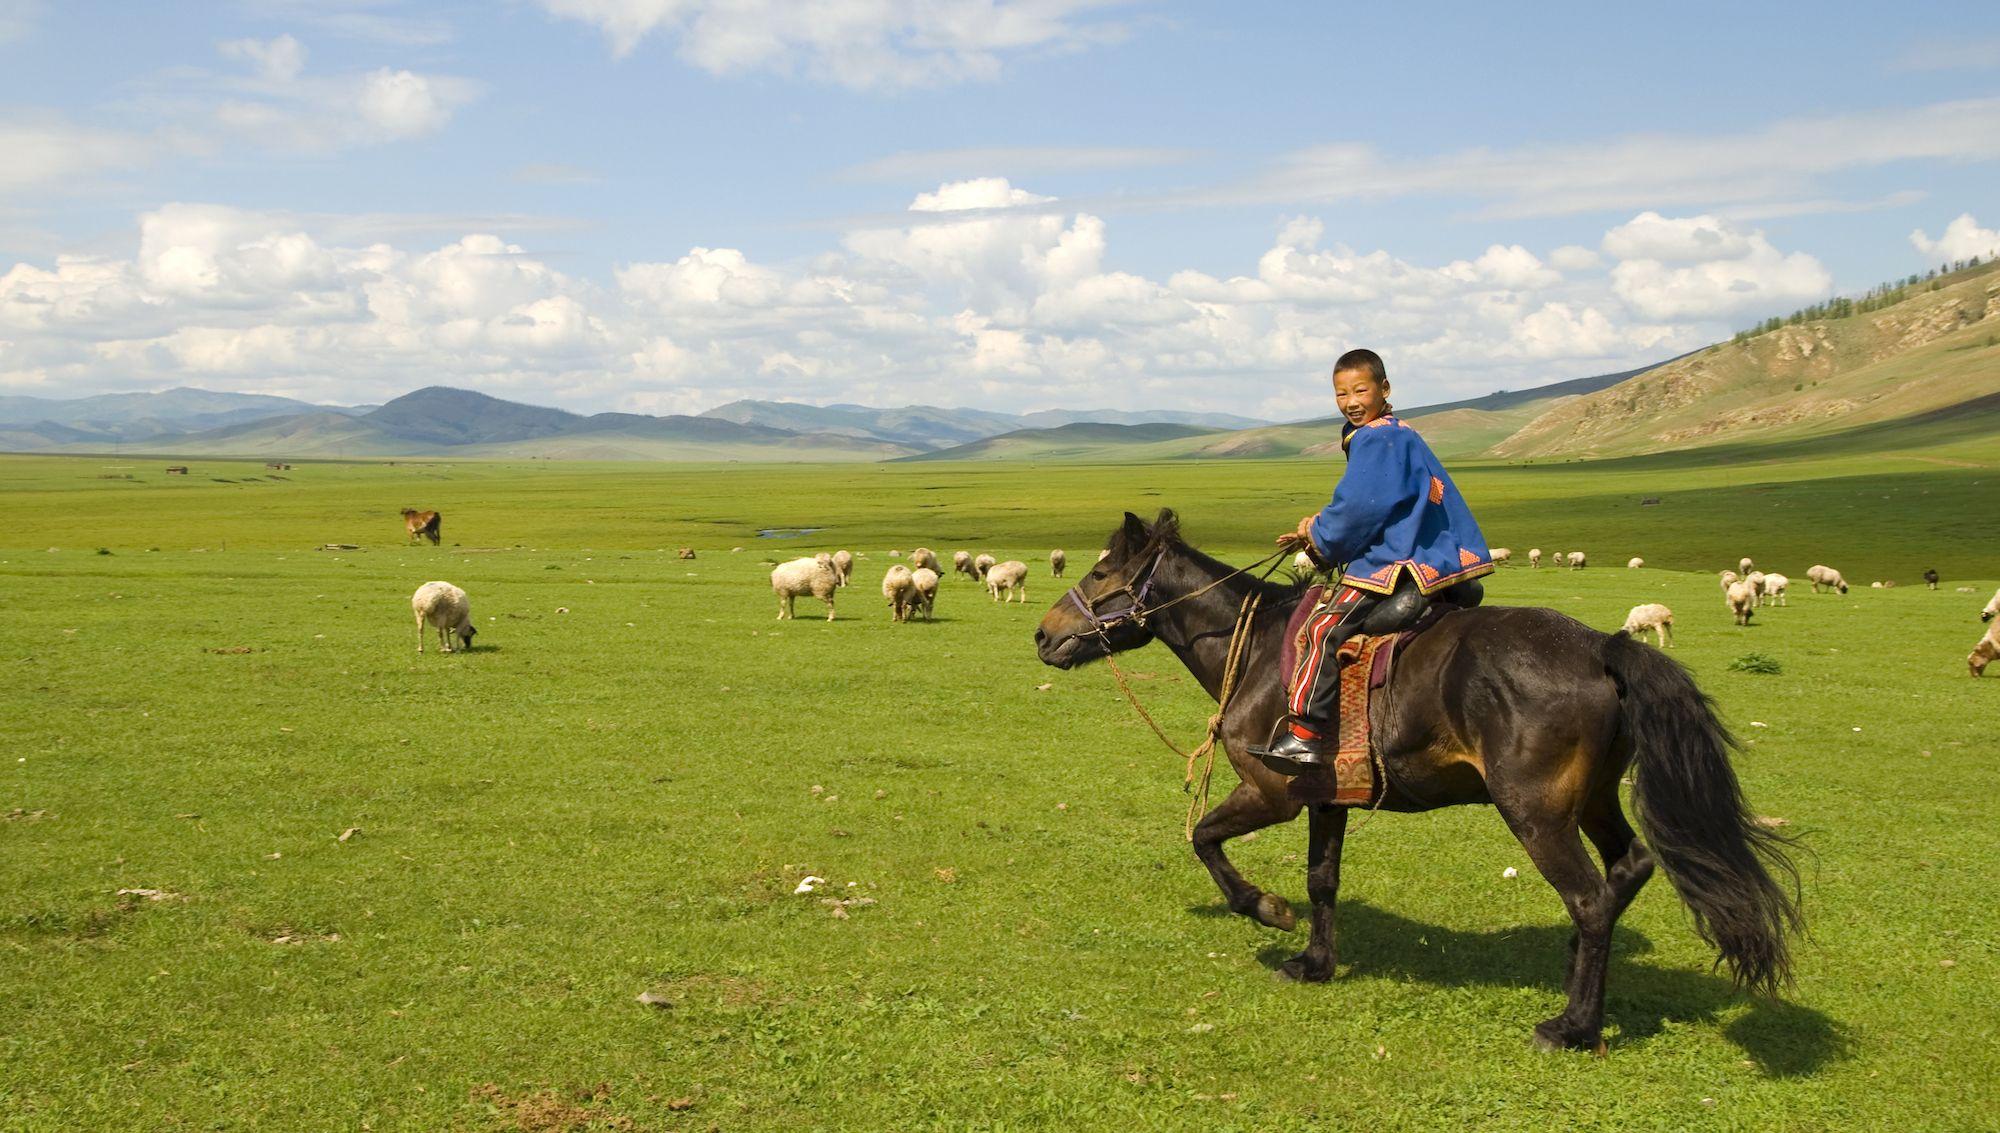 Mongolian boy tending his flock of sheep / goats.